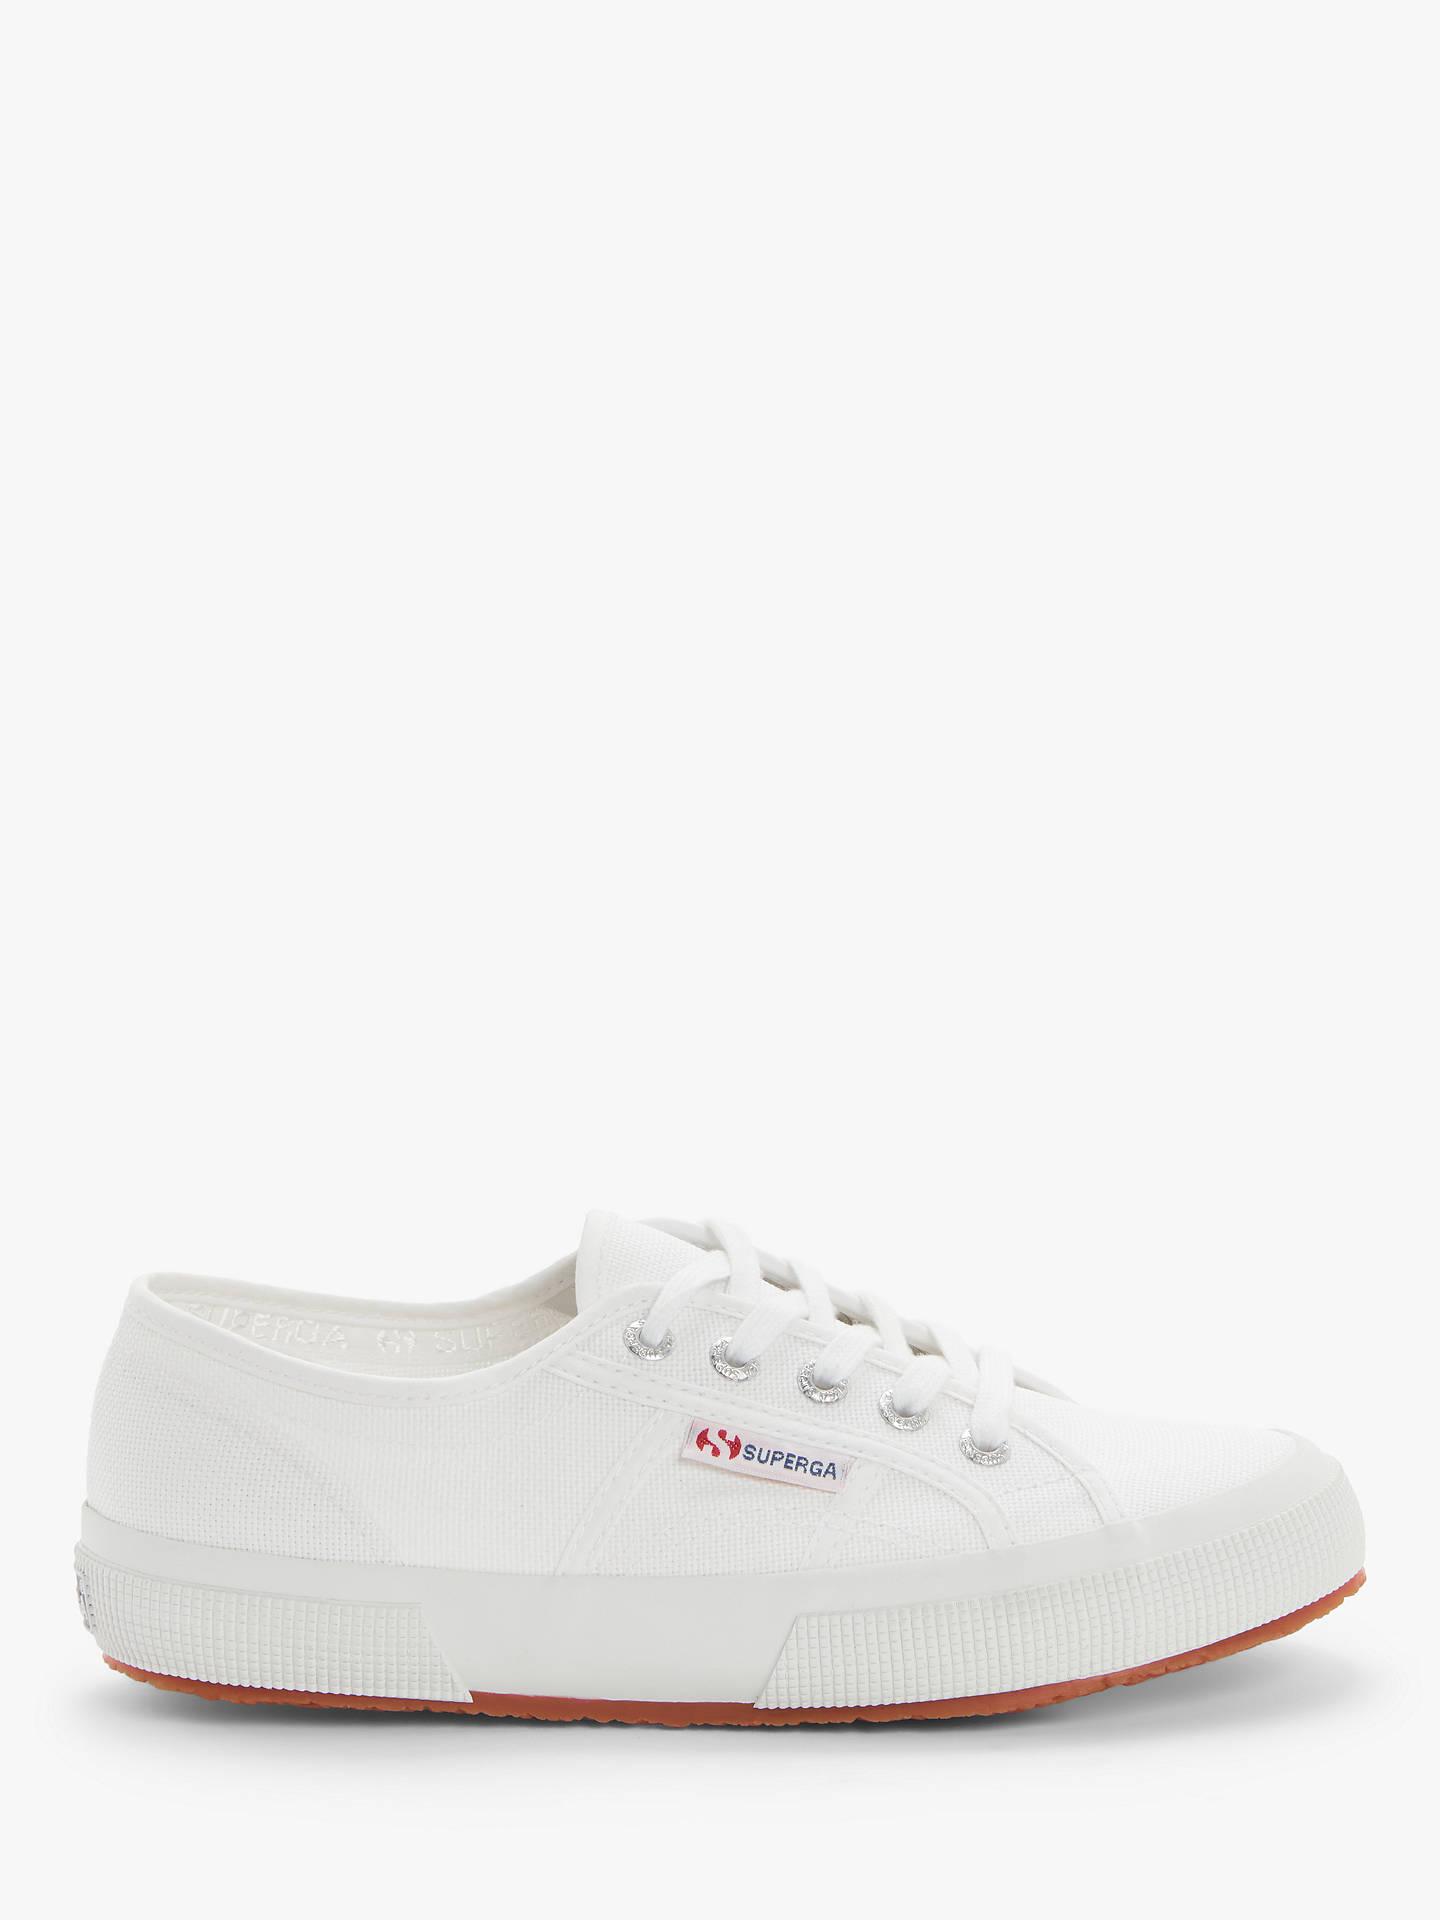 new style be189 f2720 Superga 2750 Cotu Classic Plimsolls, White